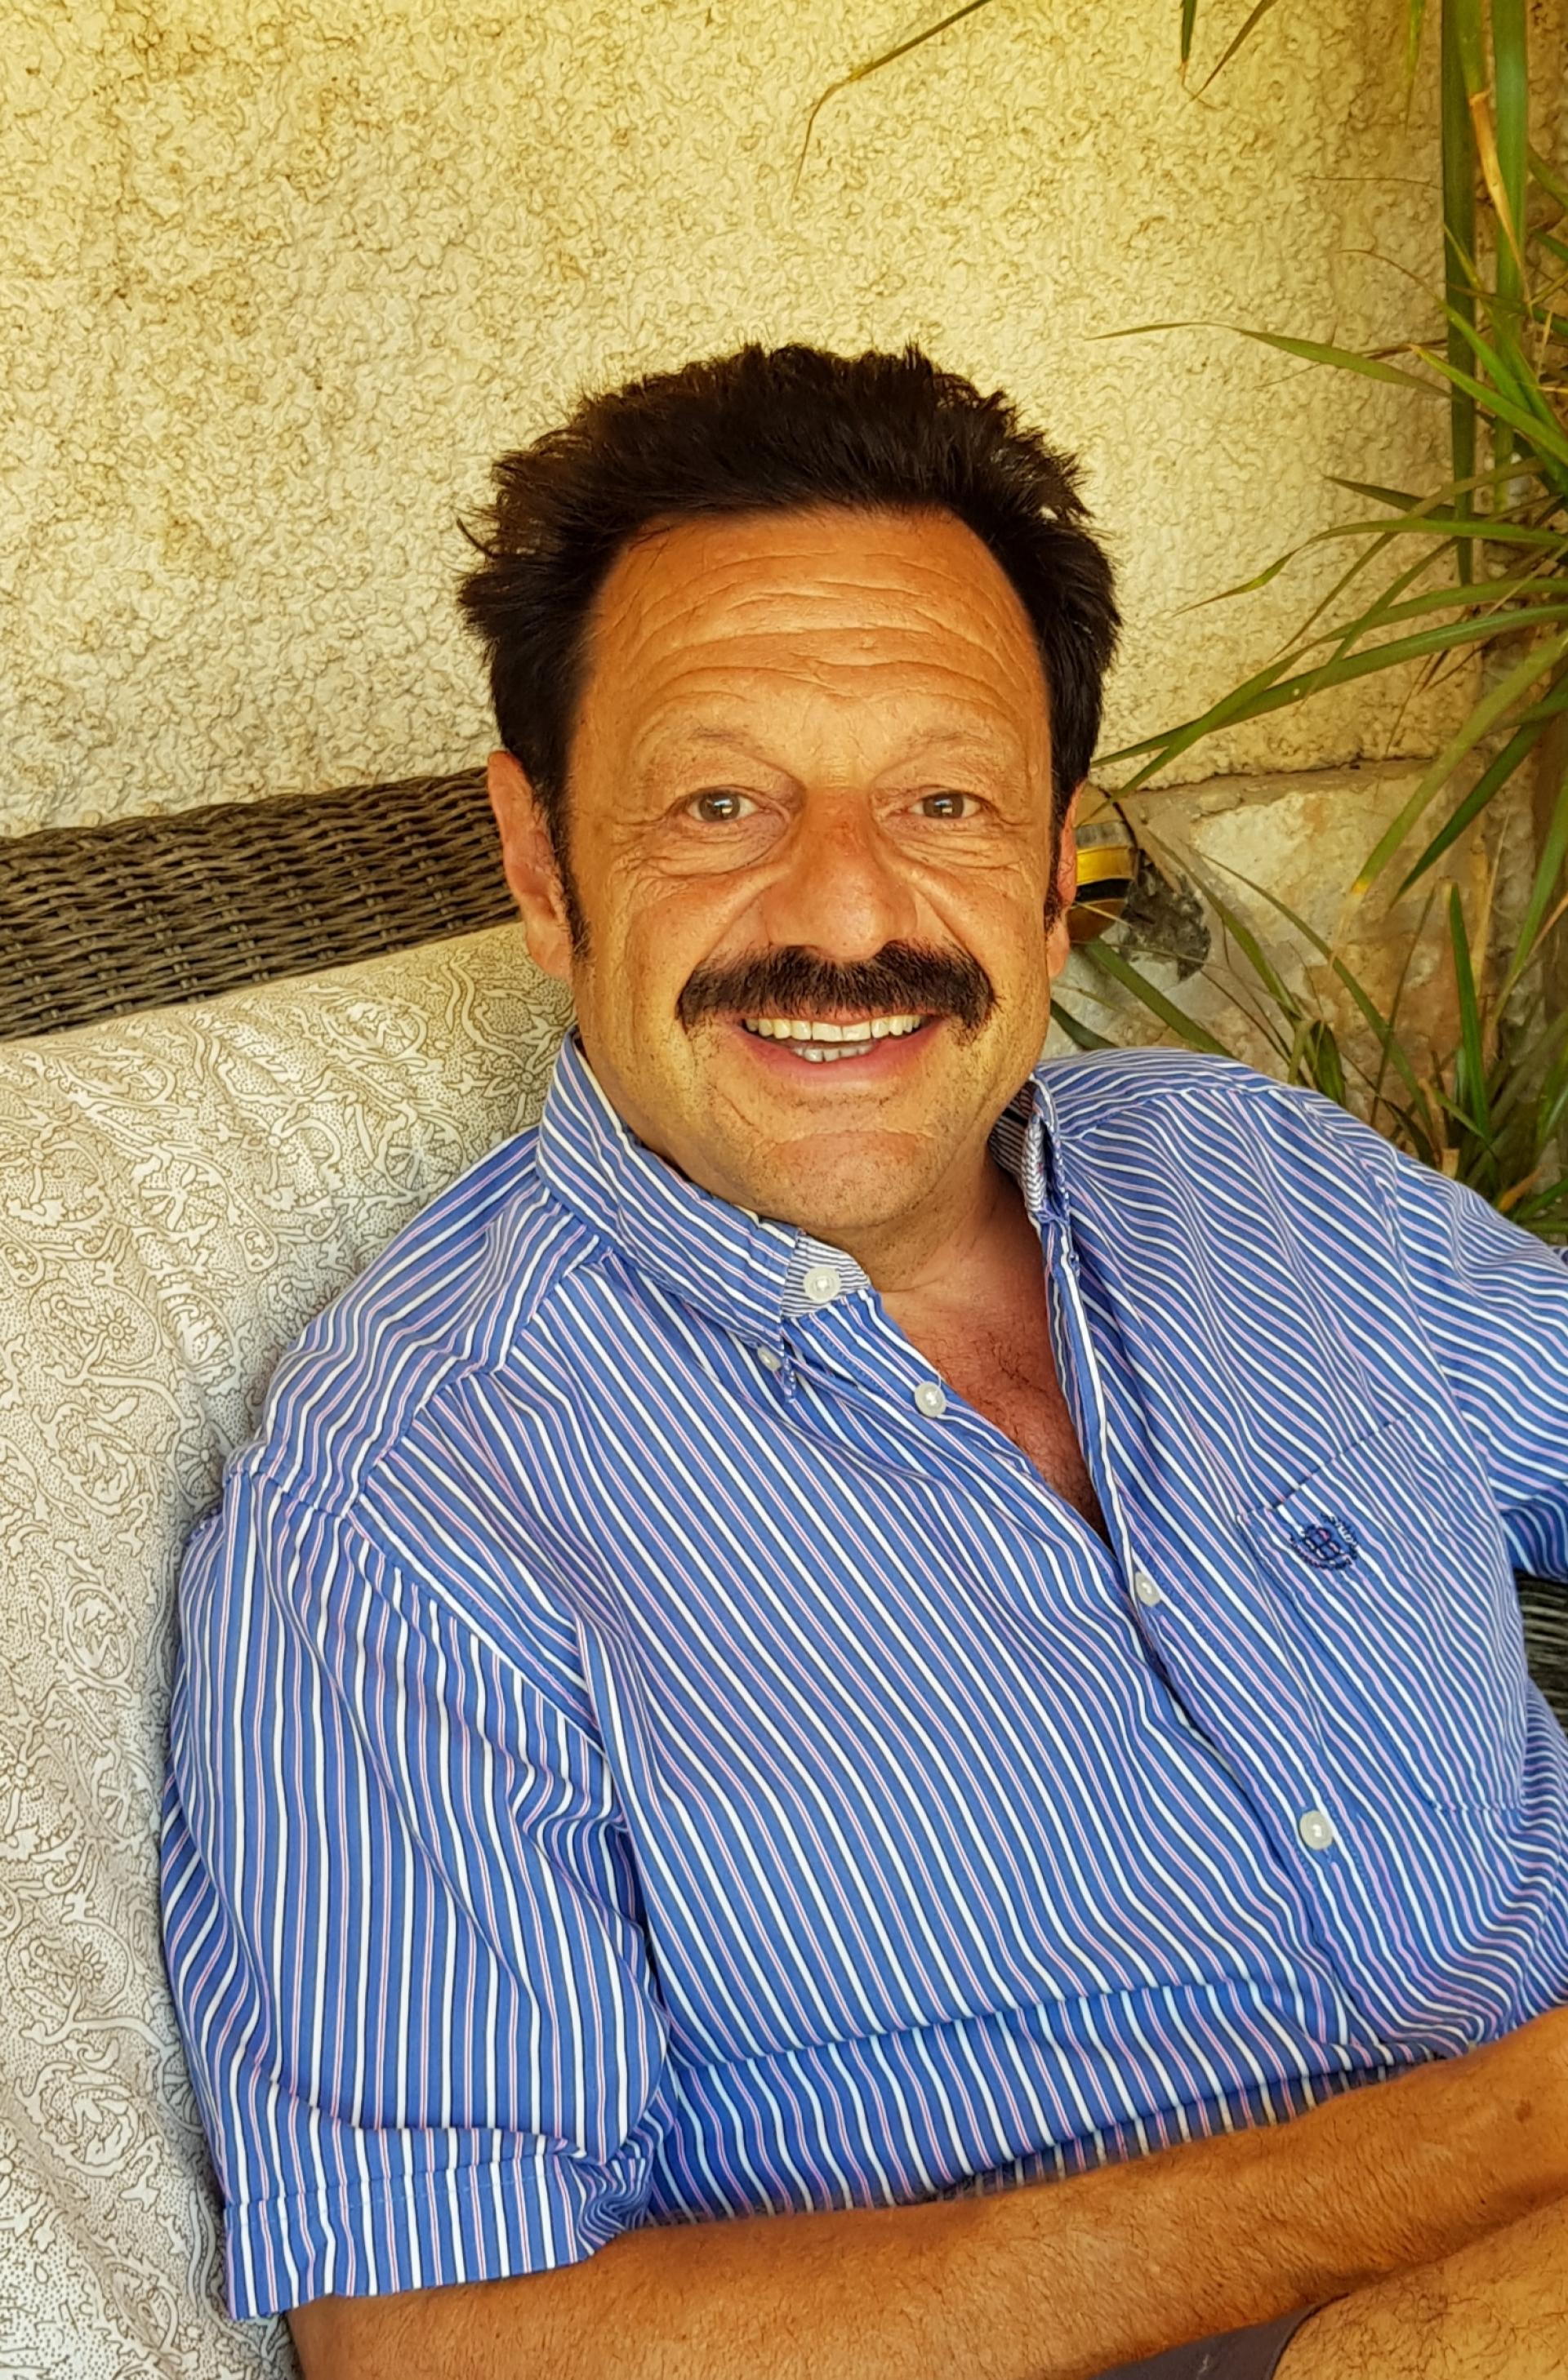 Roberto Sendoya Escobar / Phillip Witcomb